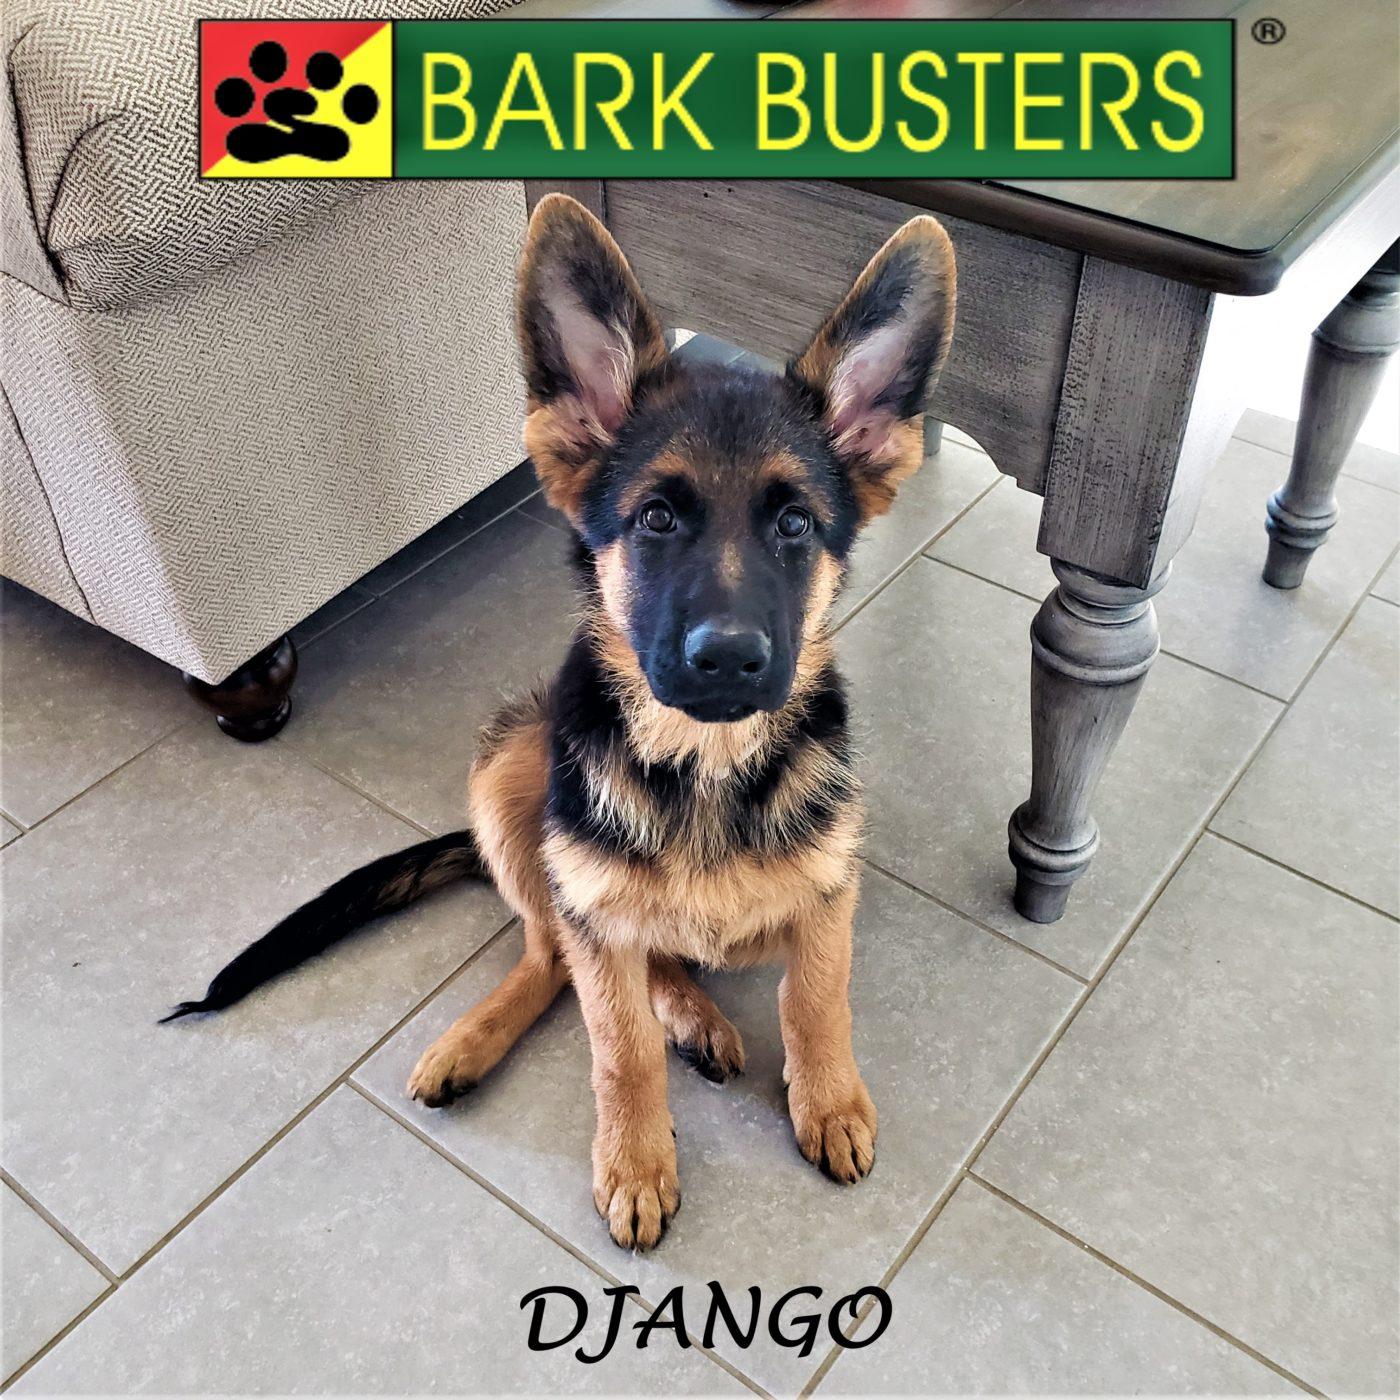 #germanshepherd #puppytraining #dogtrainingaustin #dogtrainernearme #barkbusters #abetterwaytoabetterdog #inhomedogtraining